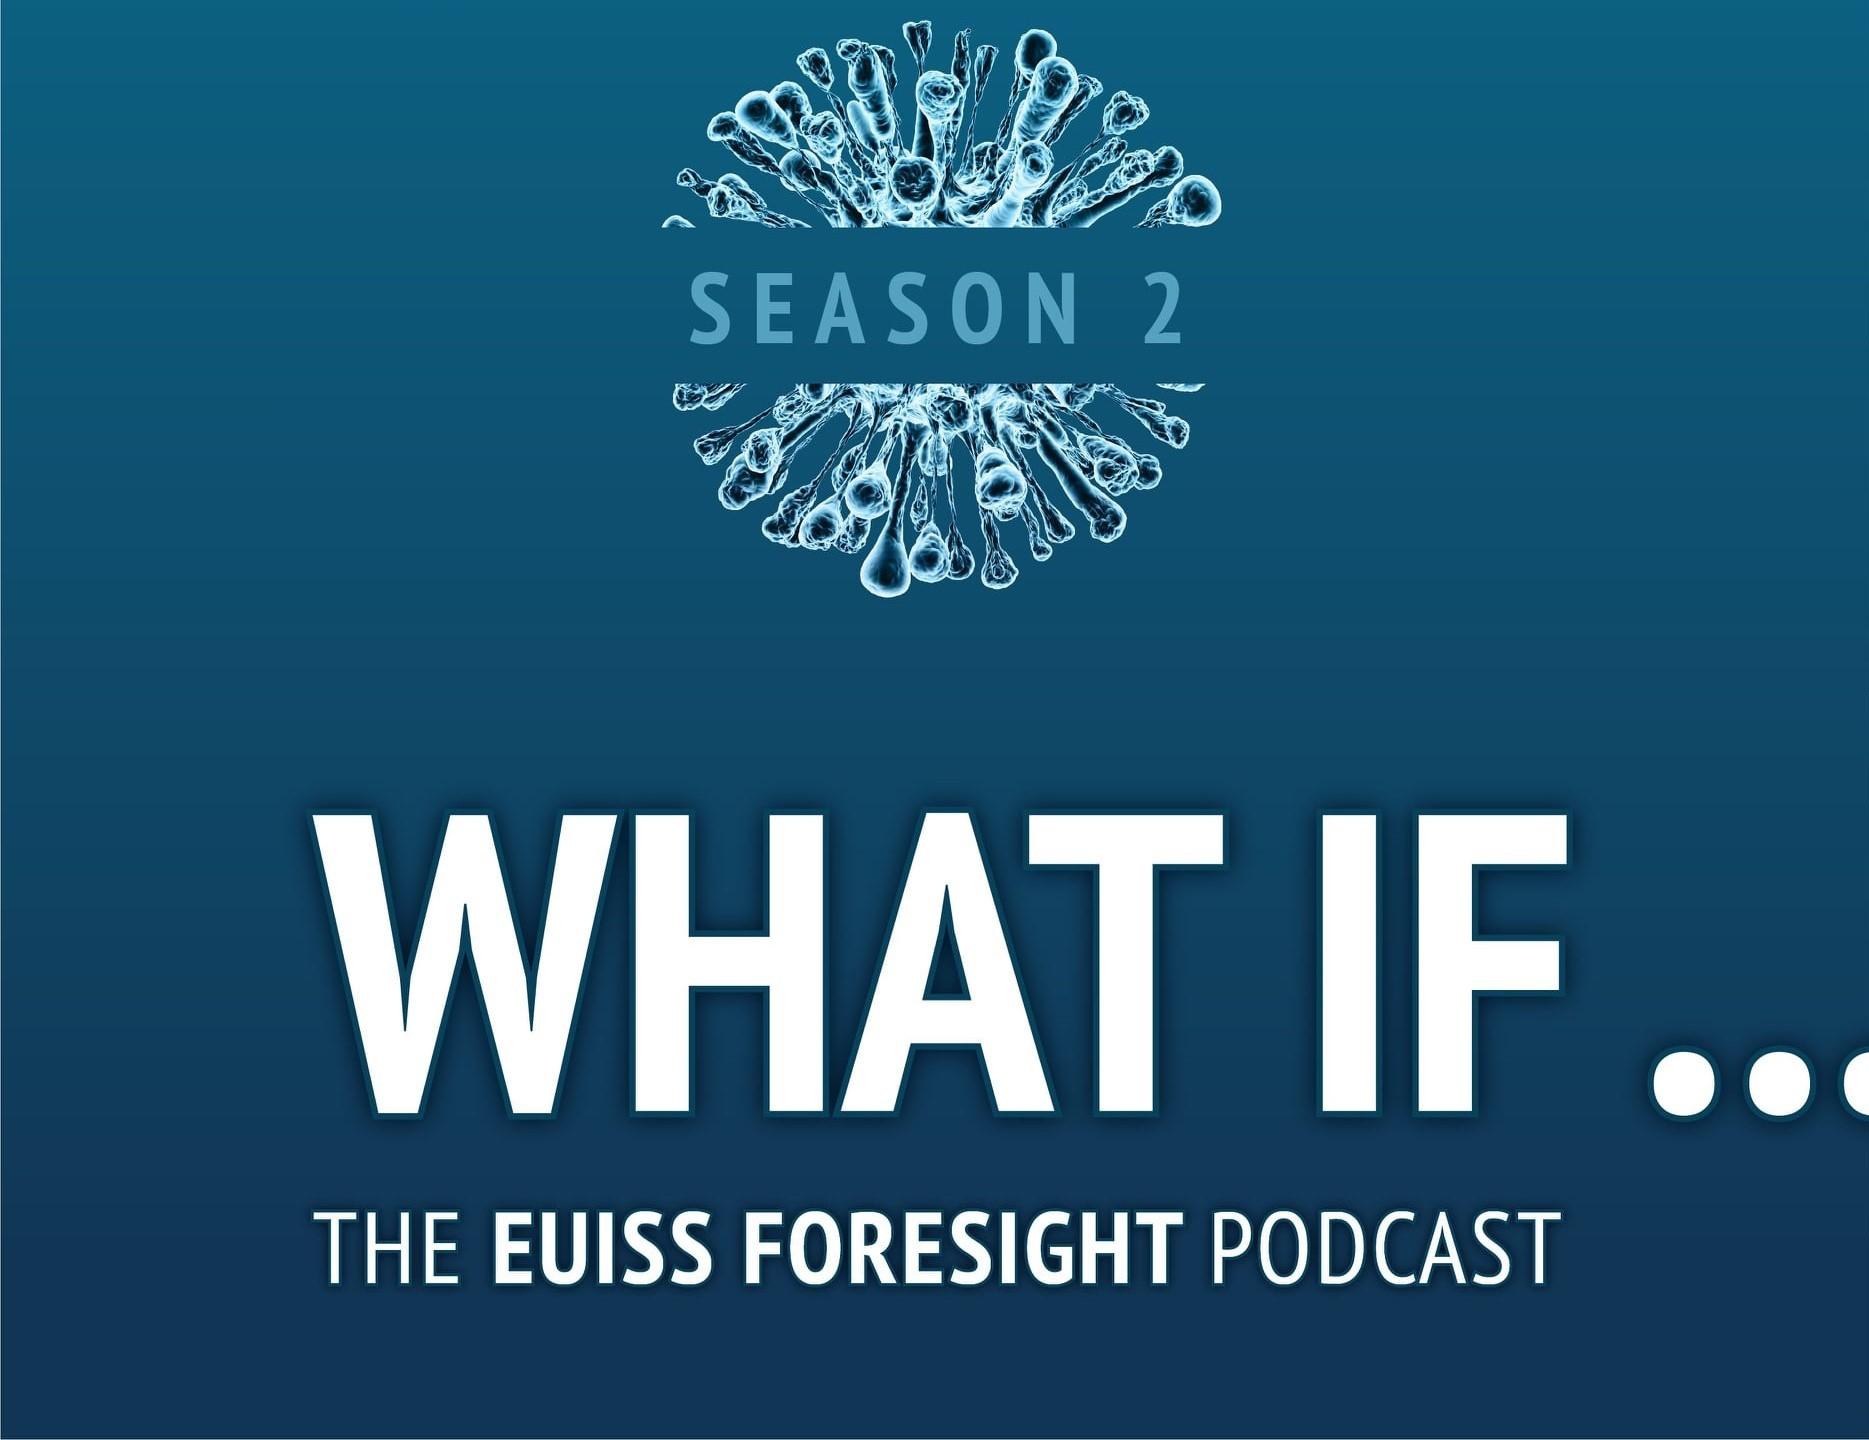 Podcast season 2 logo